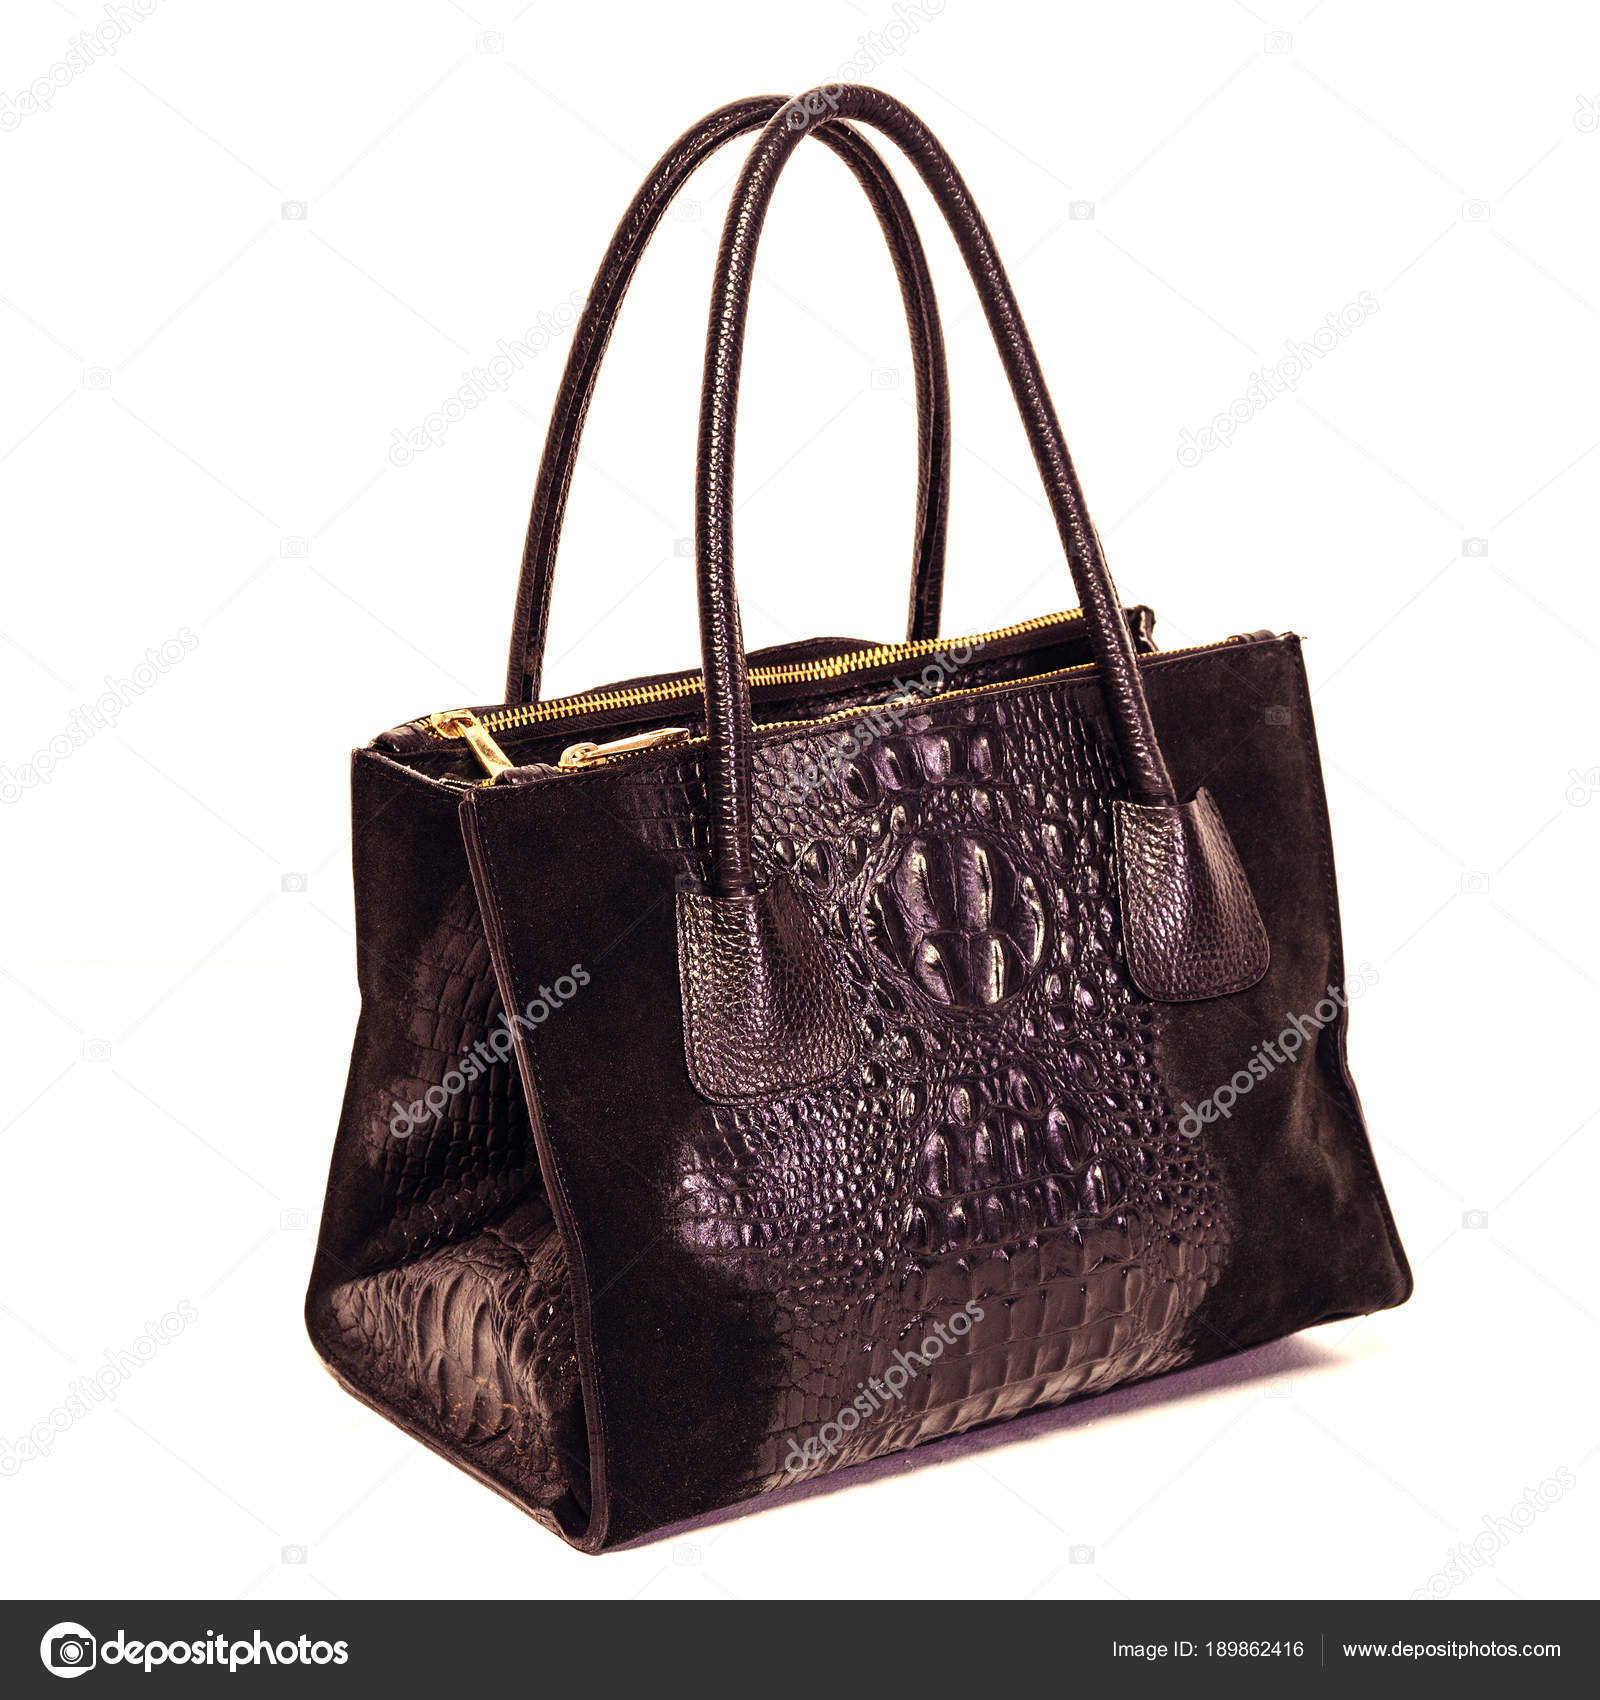 1ebeb23458 Γυναικεία μαύρη δερμάτινη τσάντα απομονώνονται σε λευκό φόντο — Εικόνα από  ...